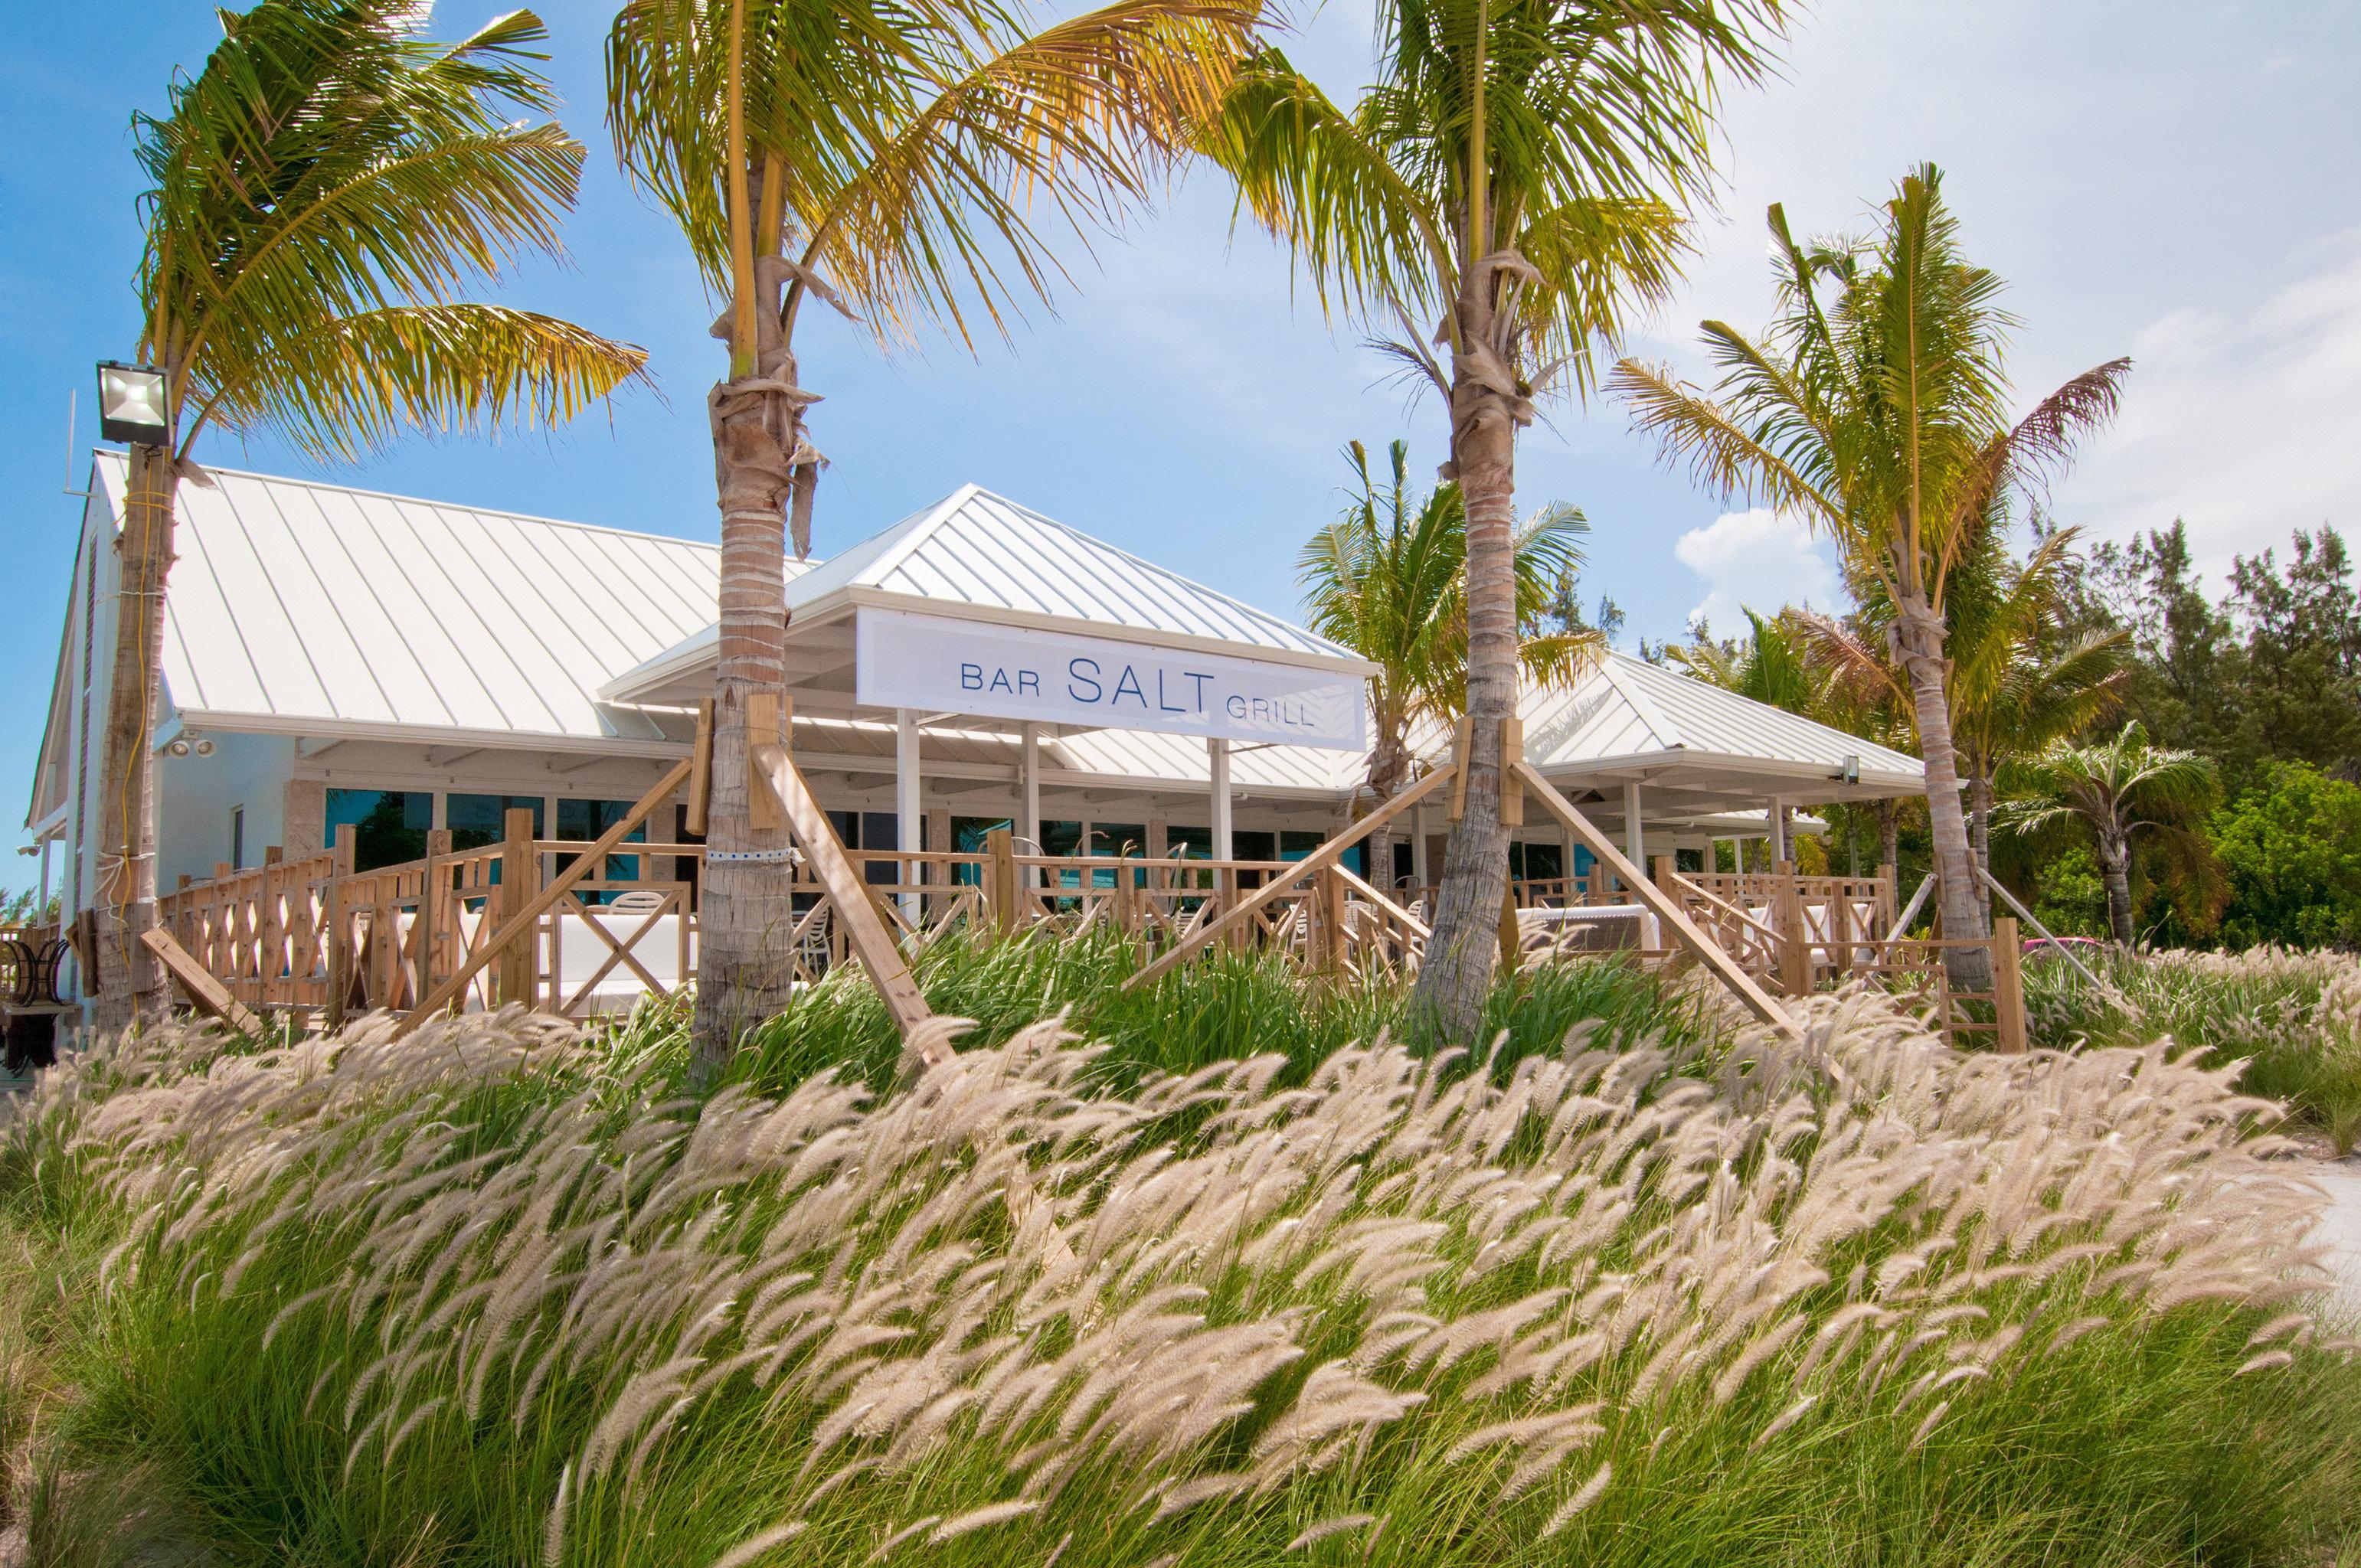 Beachfront Buildings Grounds Resort sky tree grass property arecales Beach Villa plant palm